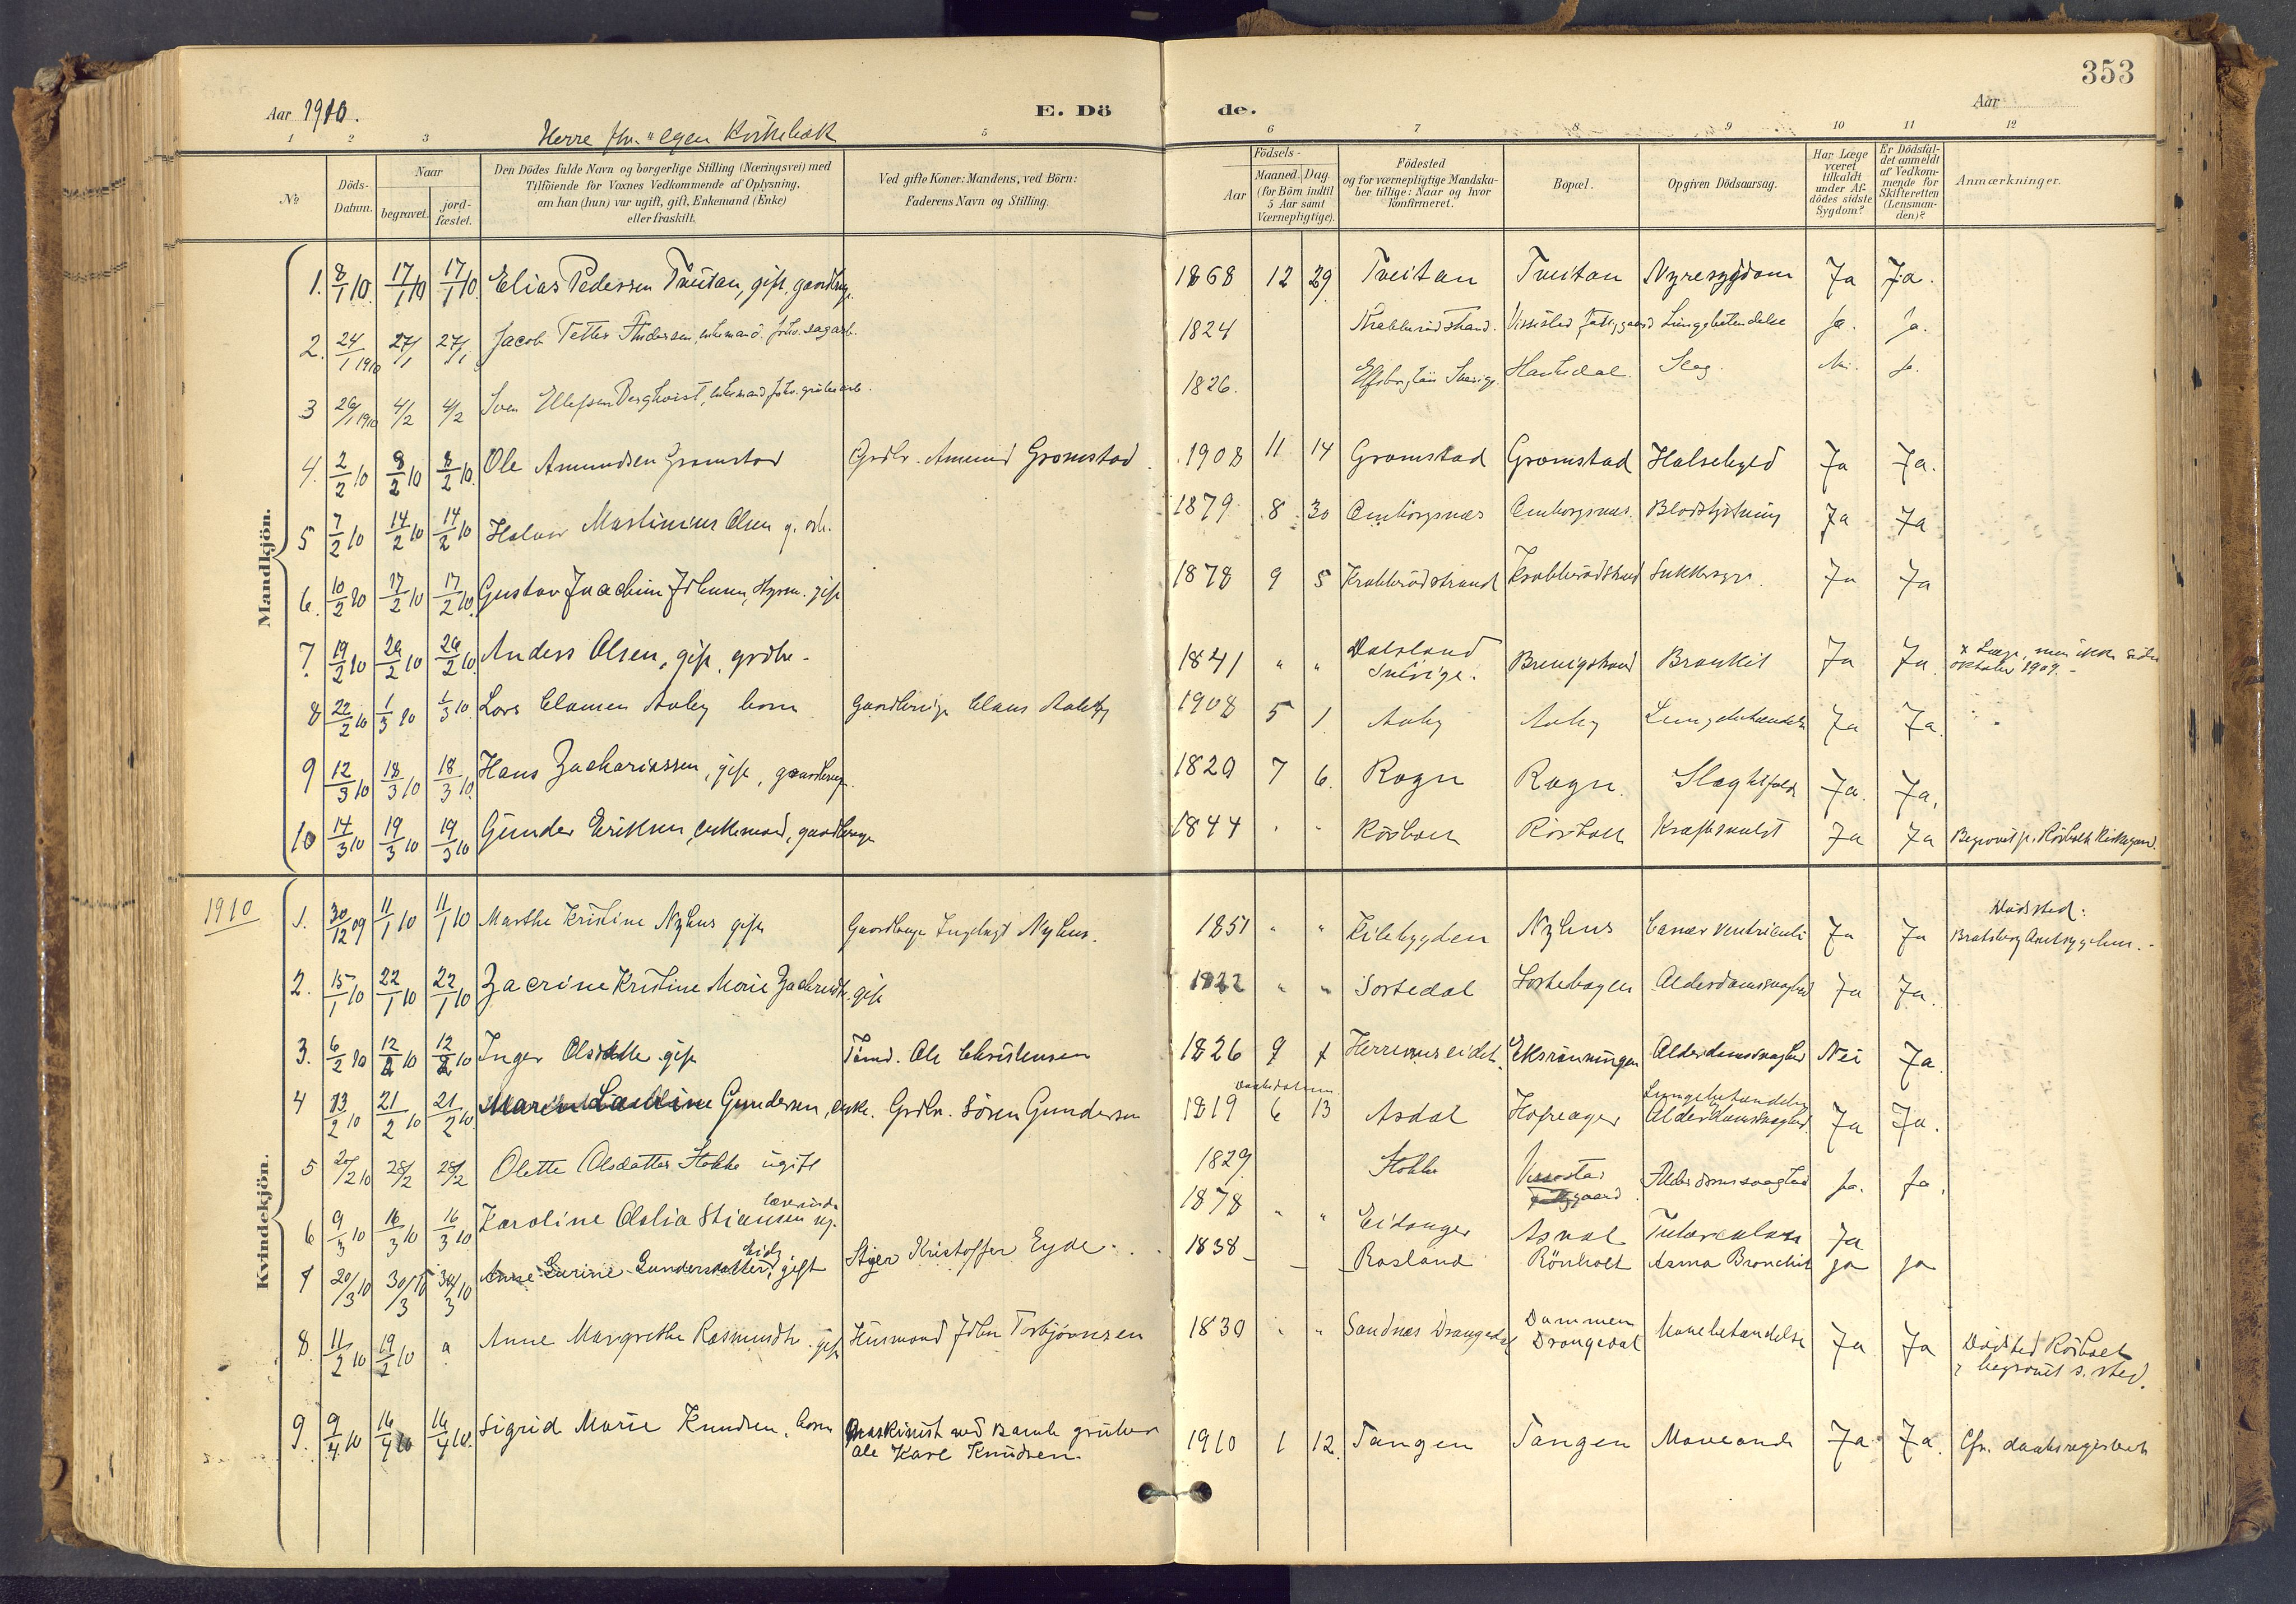 SAKO, Bamble kirkebøker, F/Fa/L0009: Ministerialbok nr. I 9, 1901-1917, s. 353